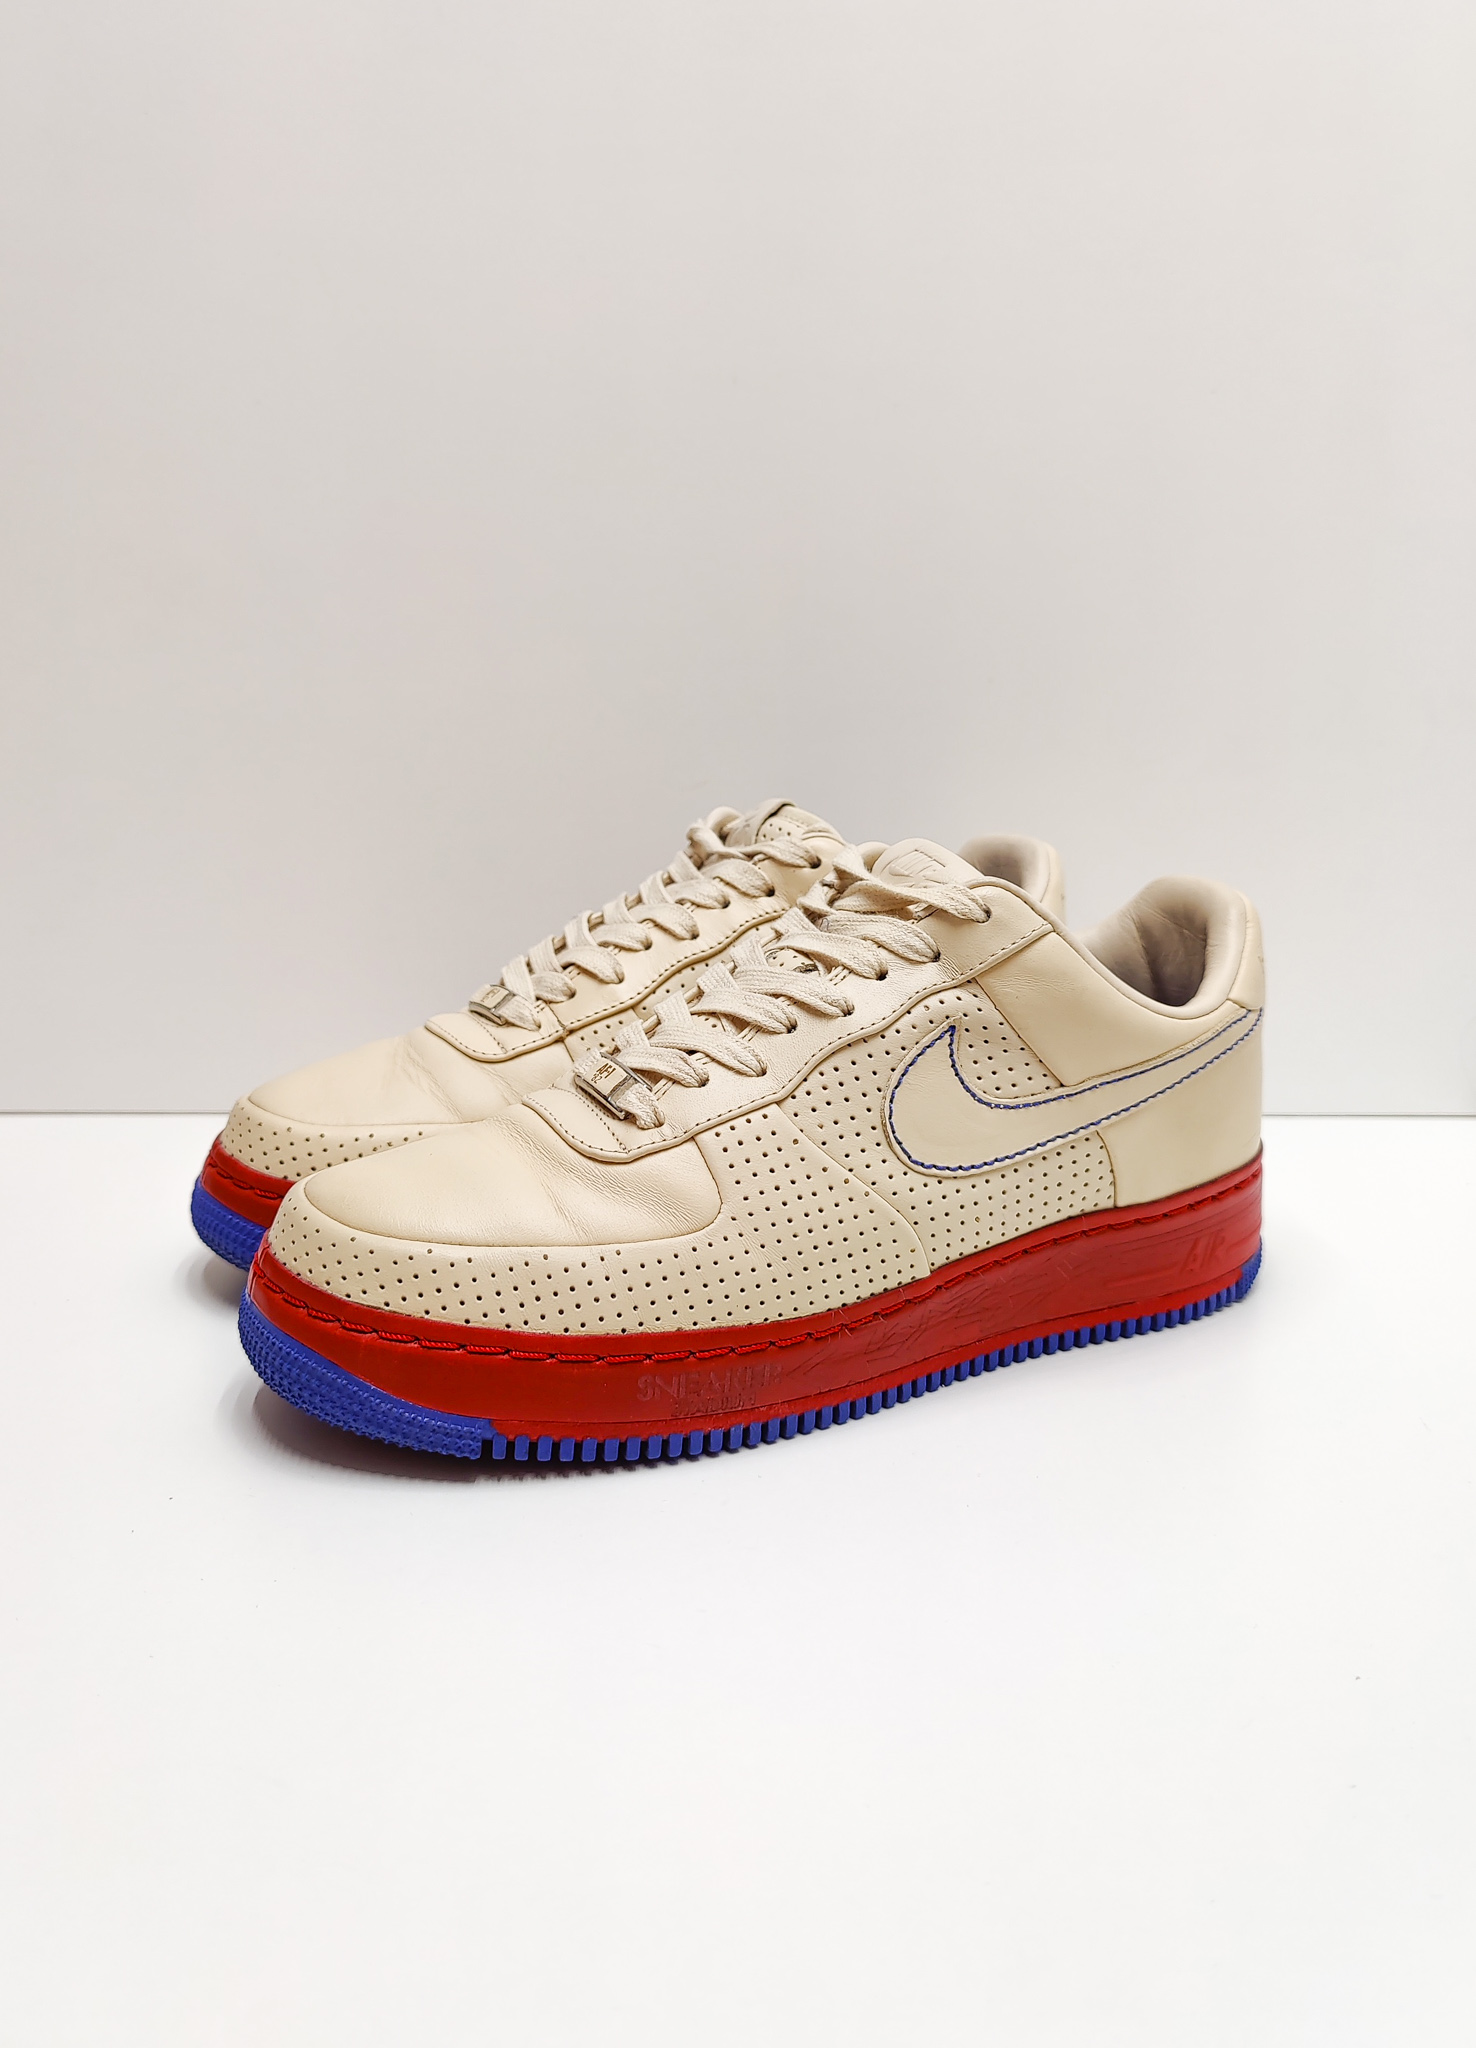 Nike Air Force 1 Low Philly Sneaker Stadium